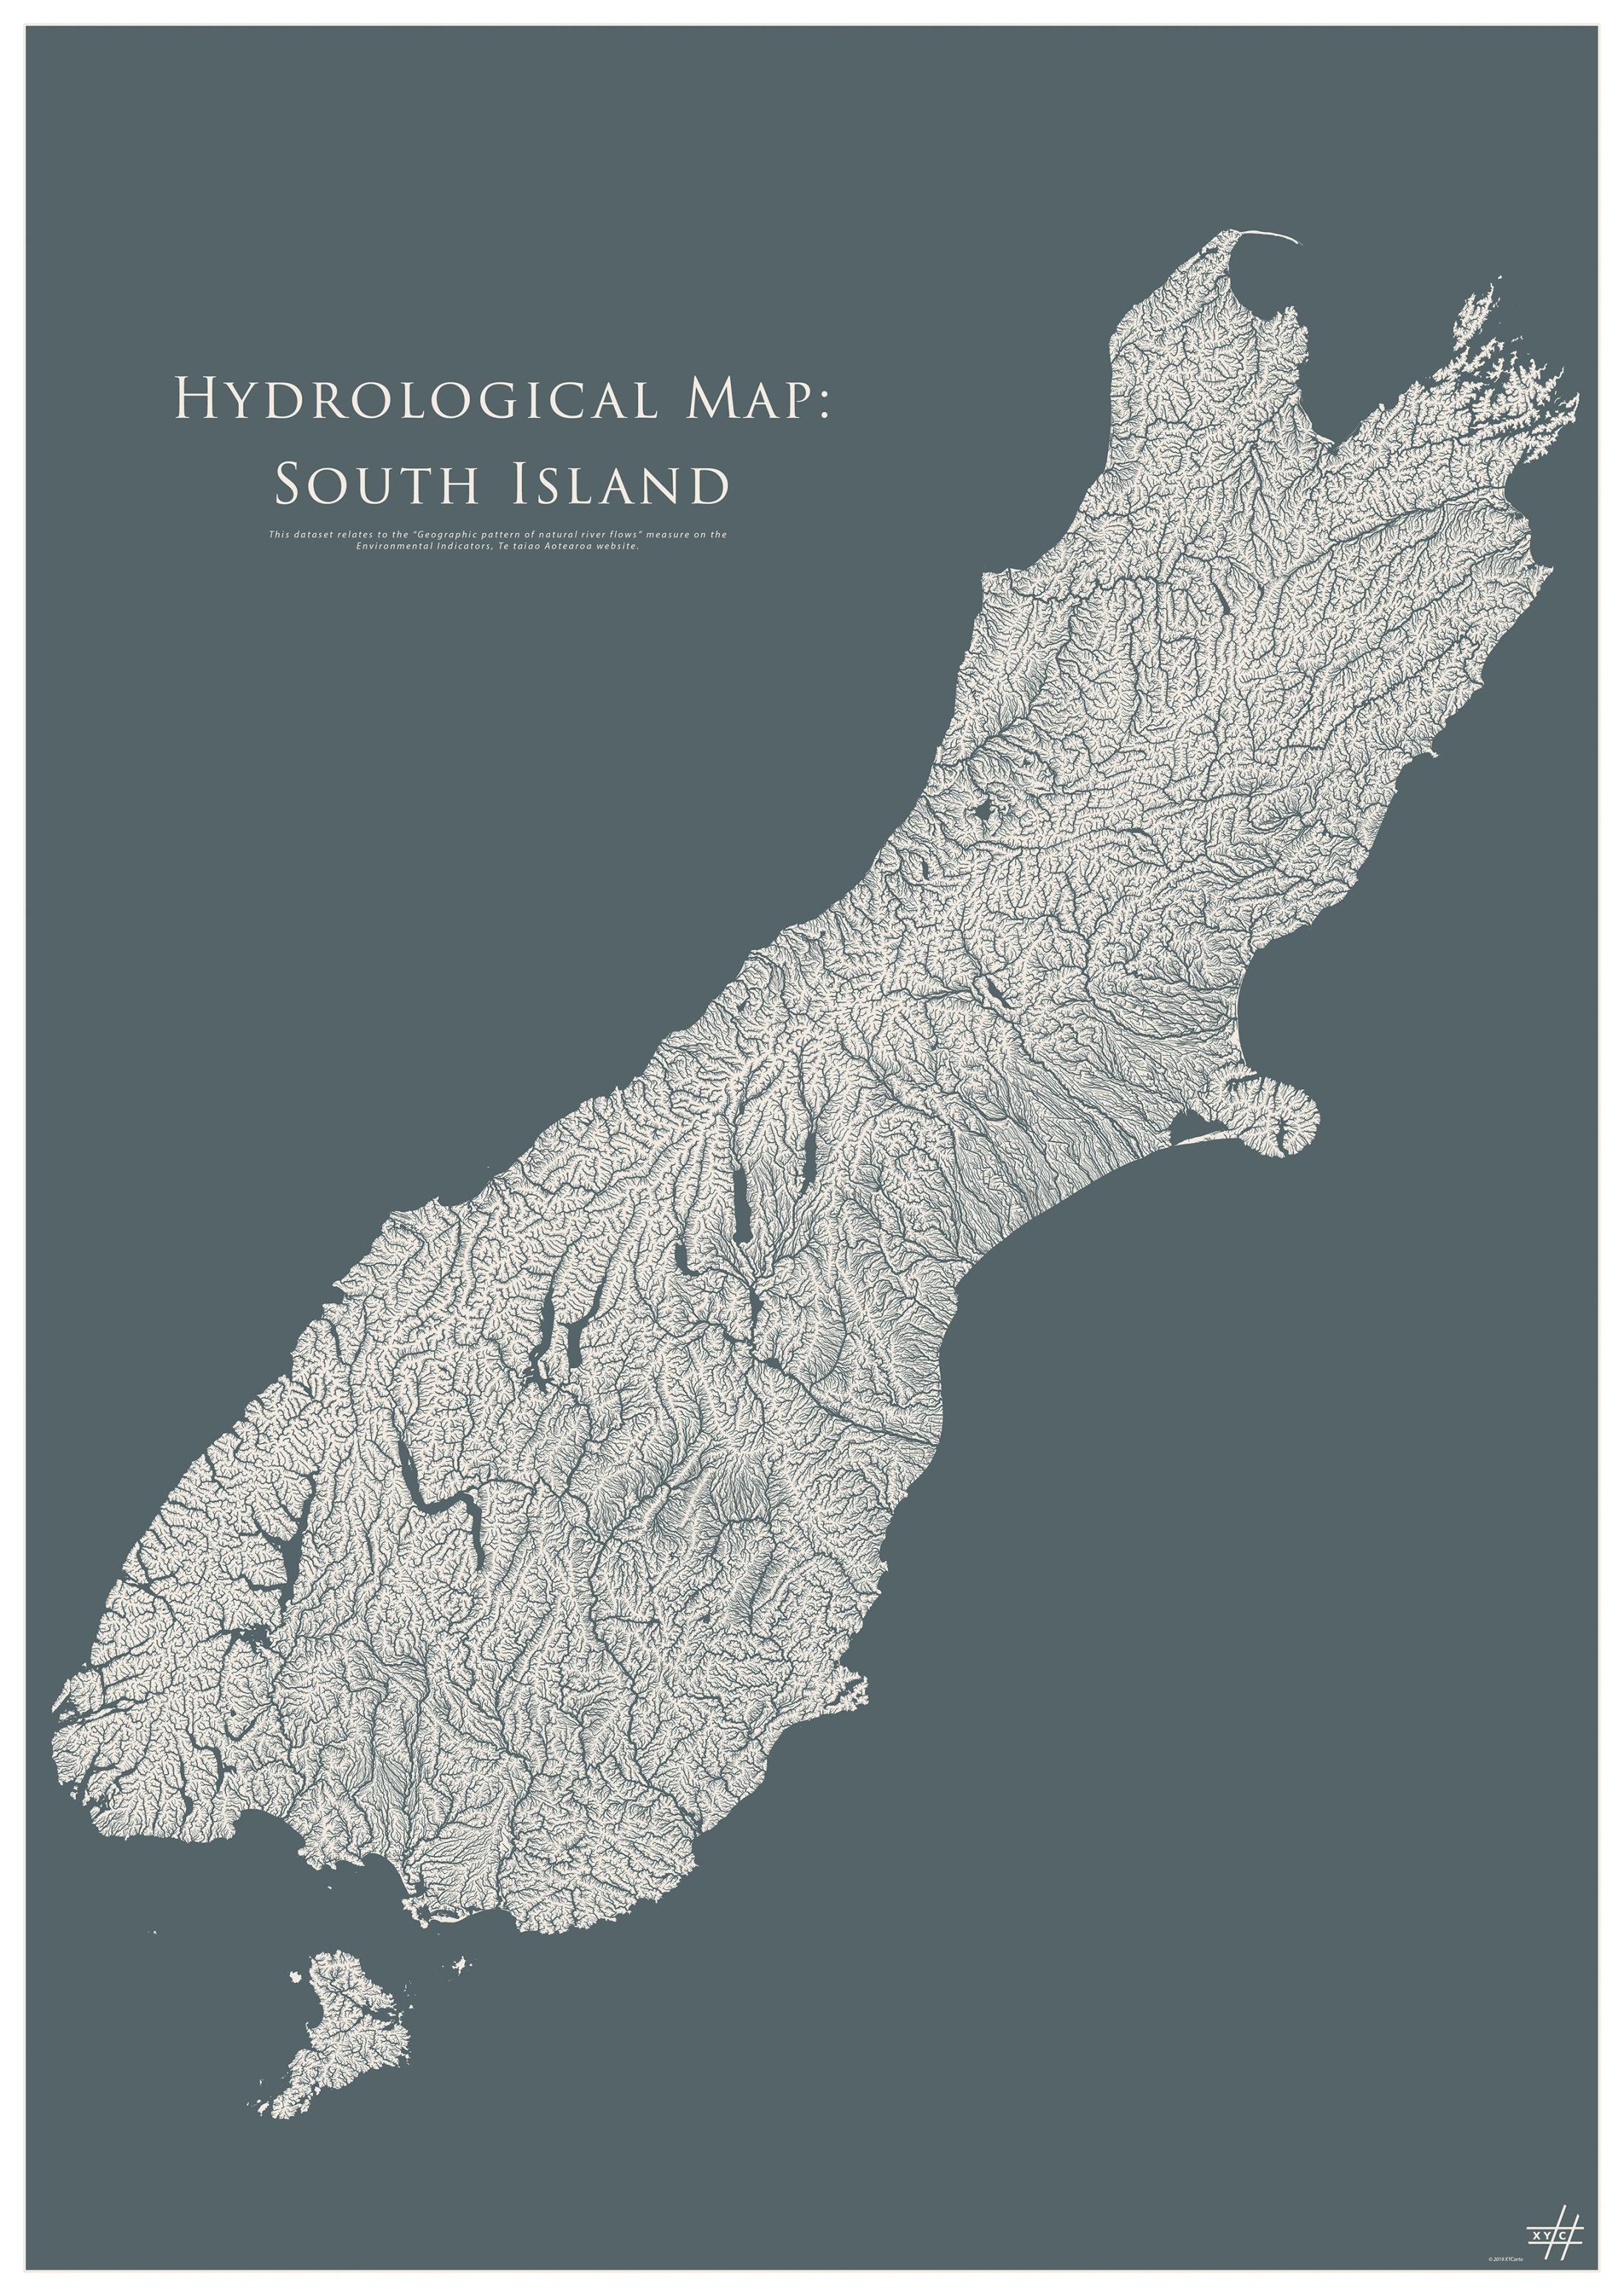 cartography_south_island_hydrology